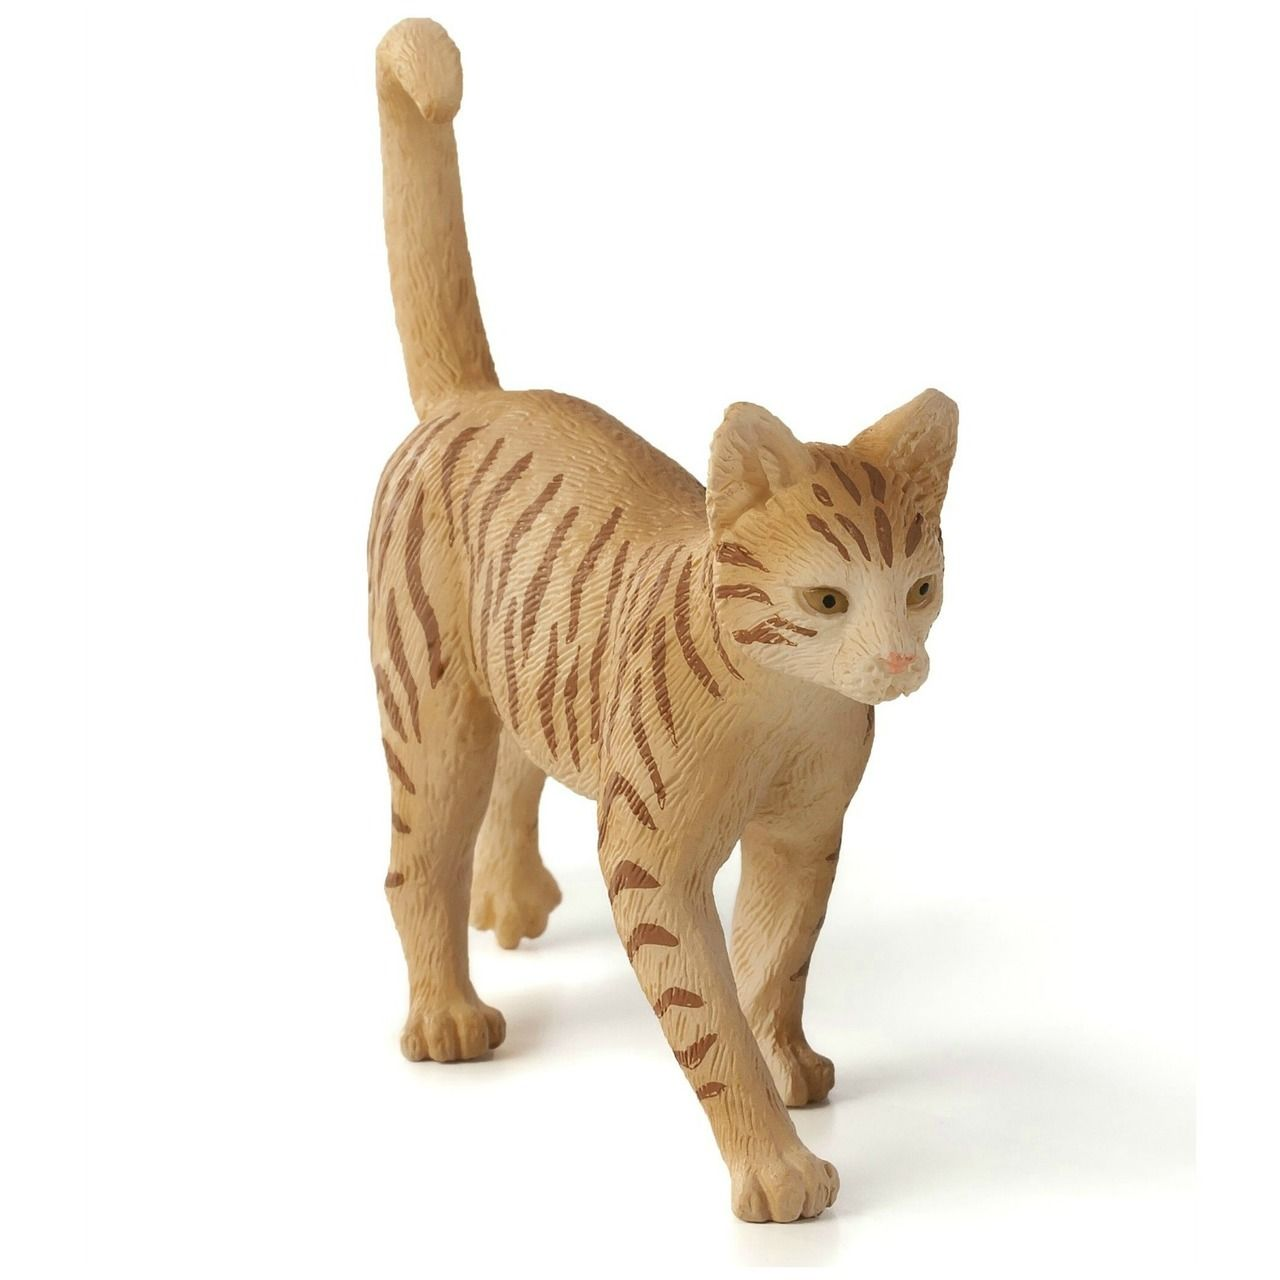 Ginger Tabby Cat figurine by Mojo at MiniZoo Tabby cat